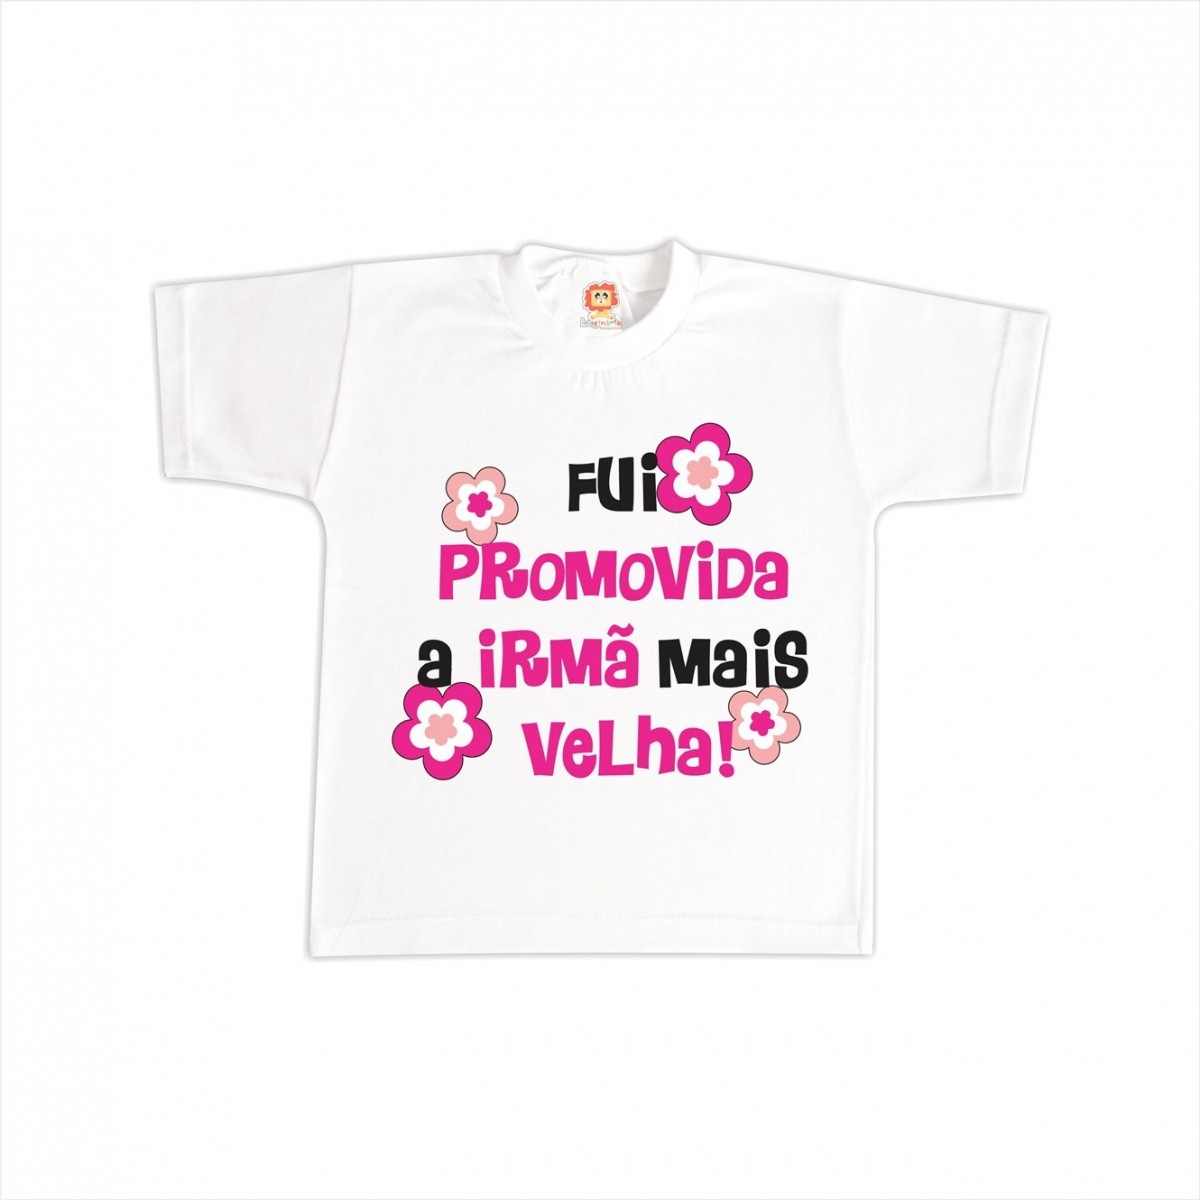 Camiseta Promovida Irmã Mais Velha